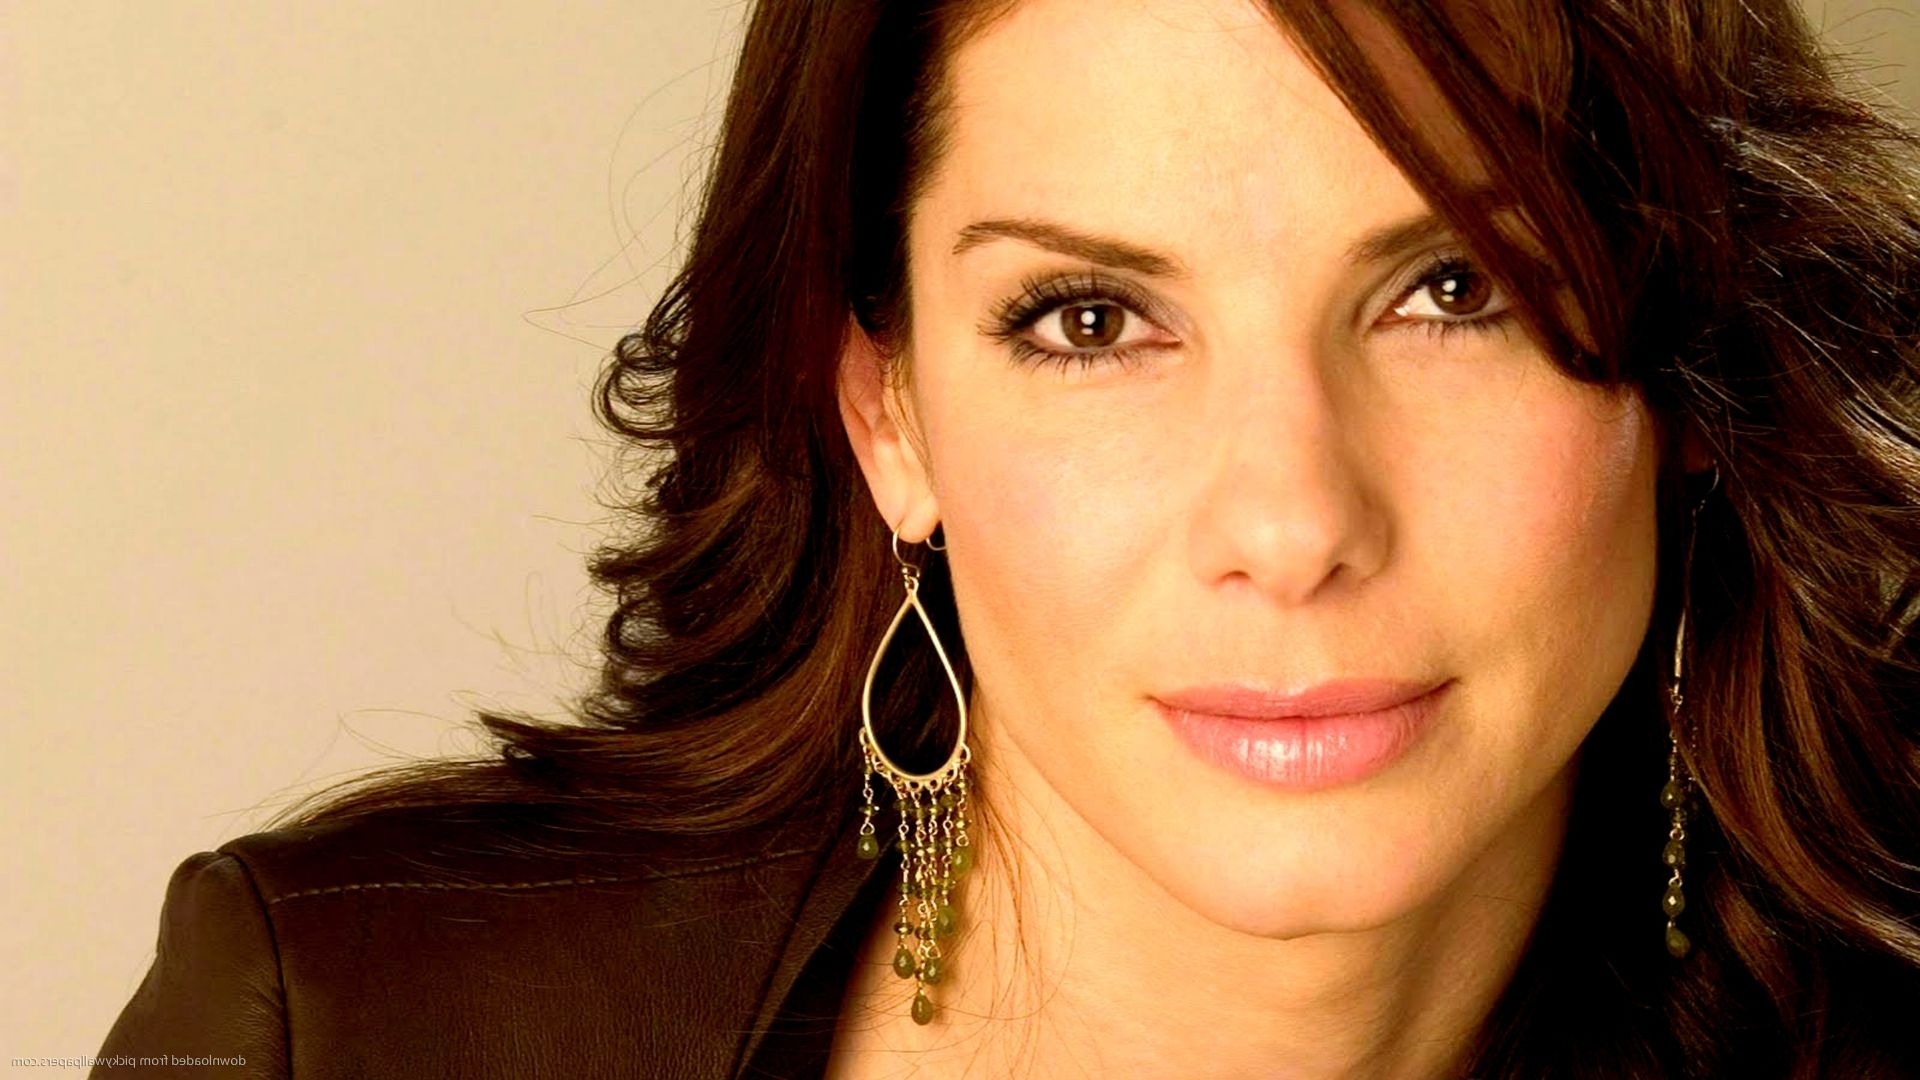 Sandra Bullock HD Wallpapers High Quality Hayley Atwell Celebrity Celebrities